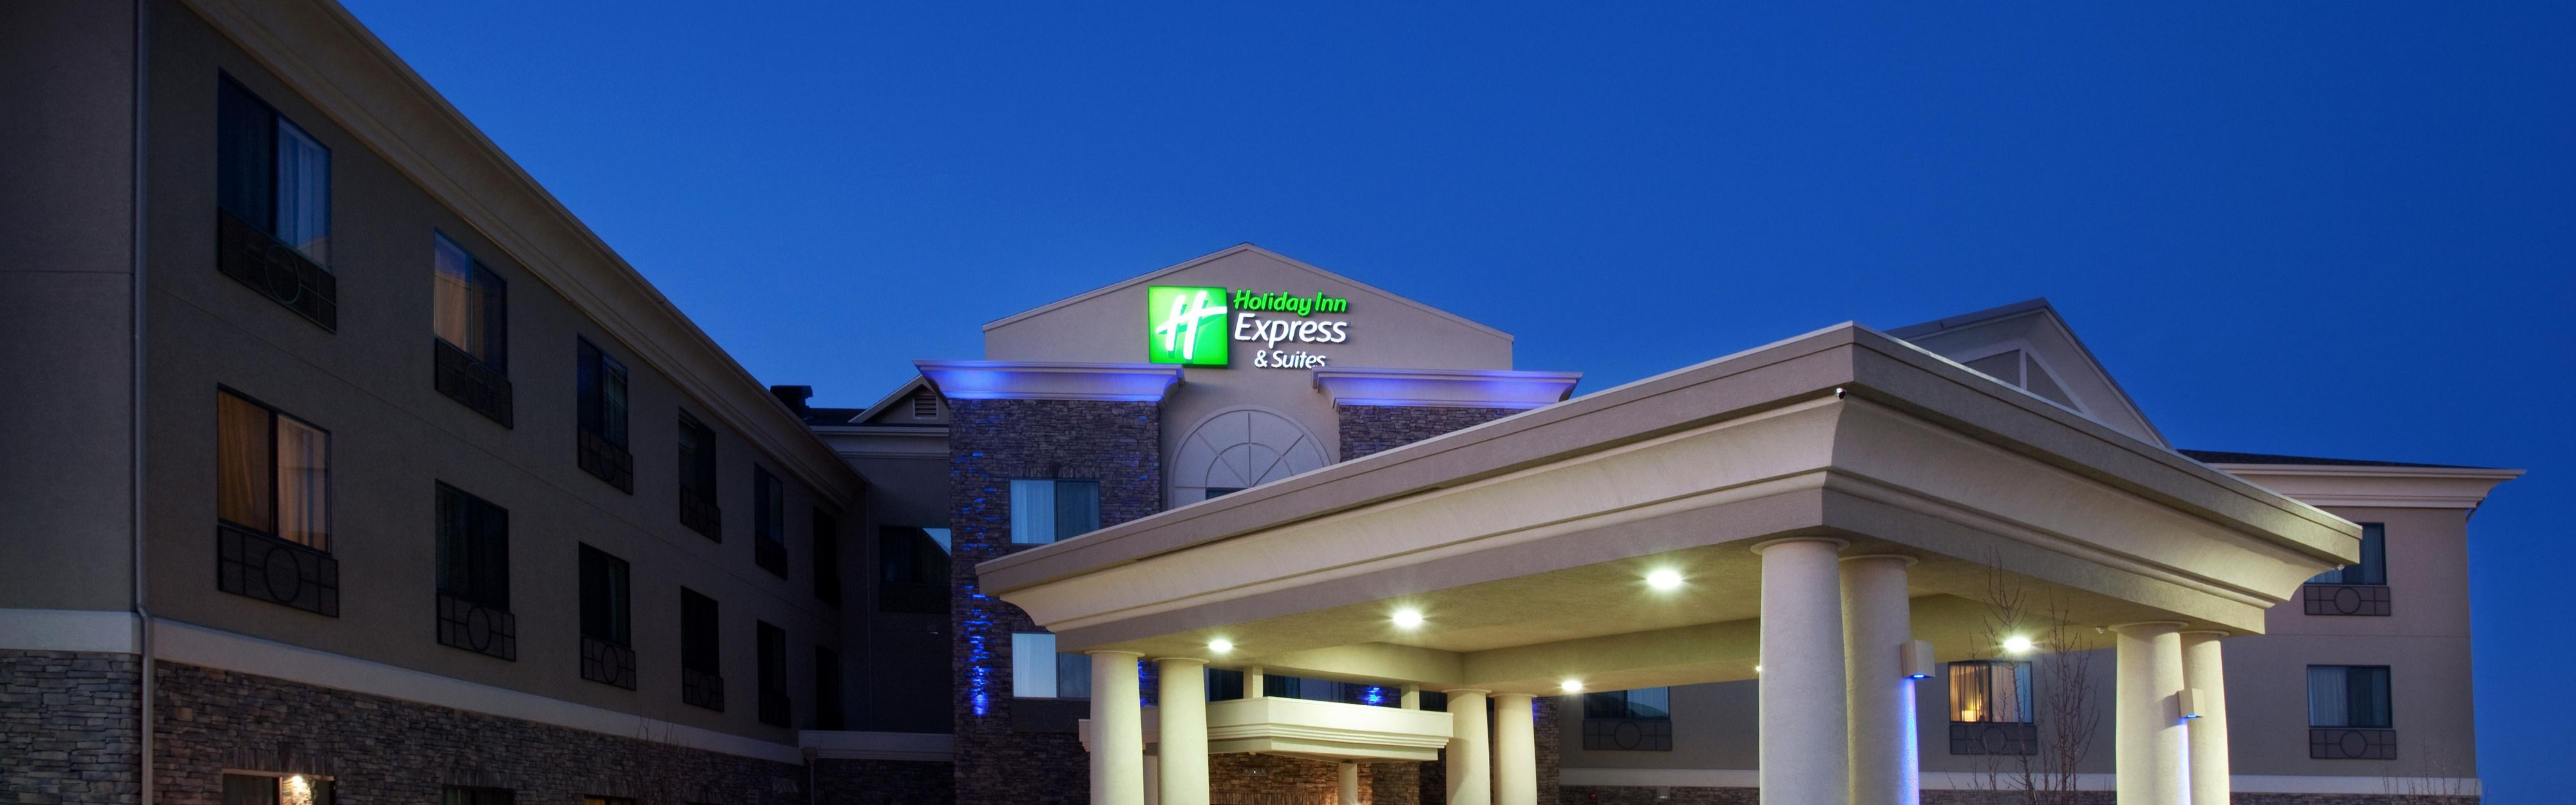 Holiday Inn Express & Suites Los Alamos Entrada Park image 0